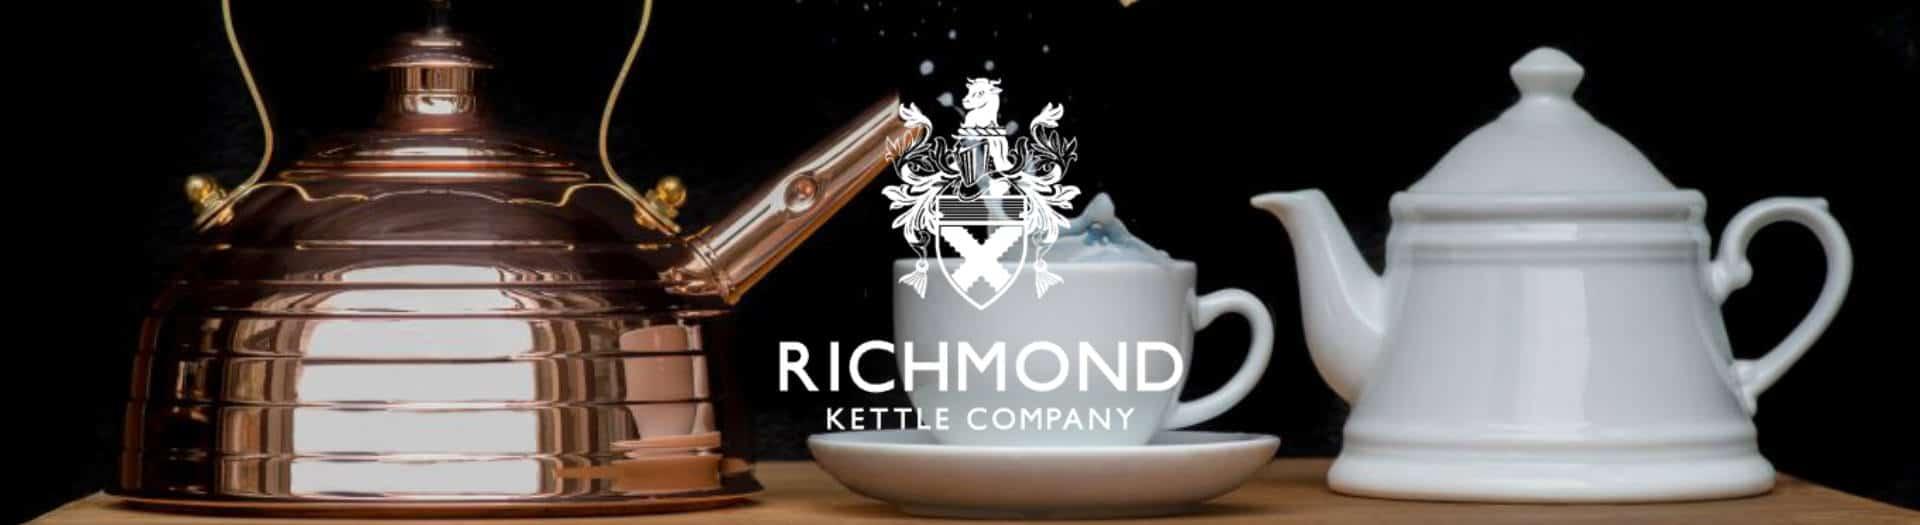 Heritage Kettle | Sir Gordon Bennett